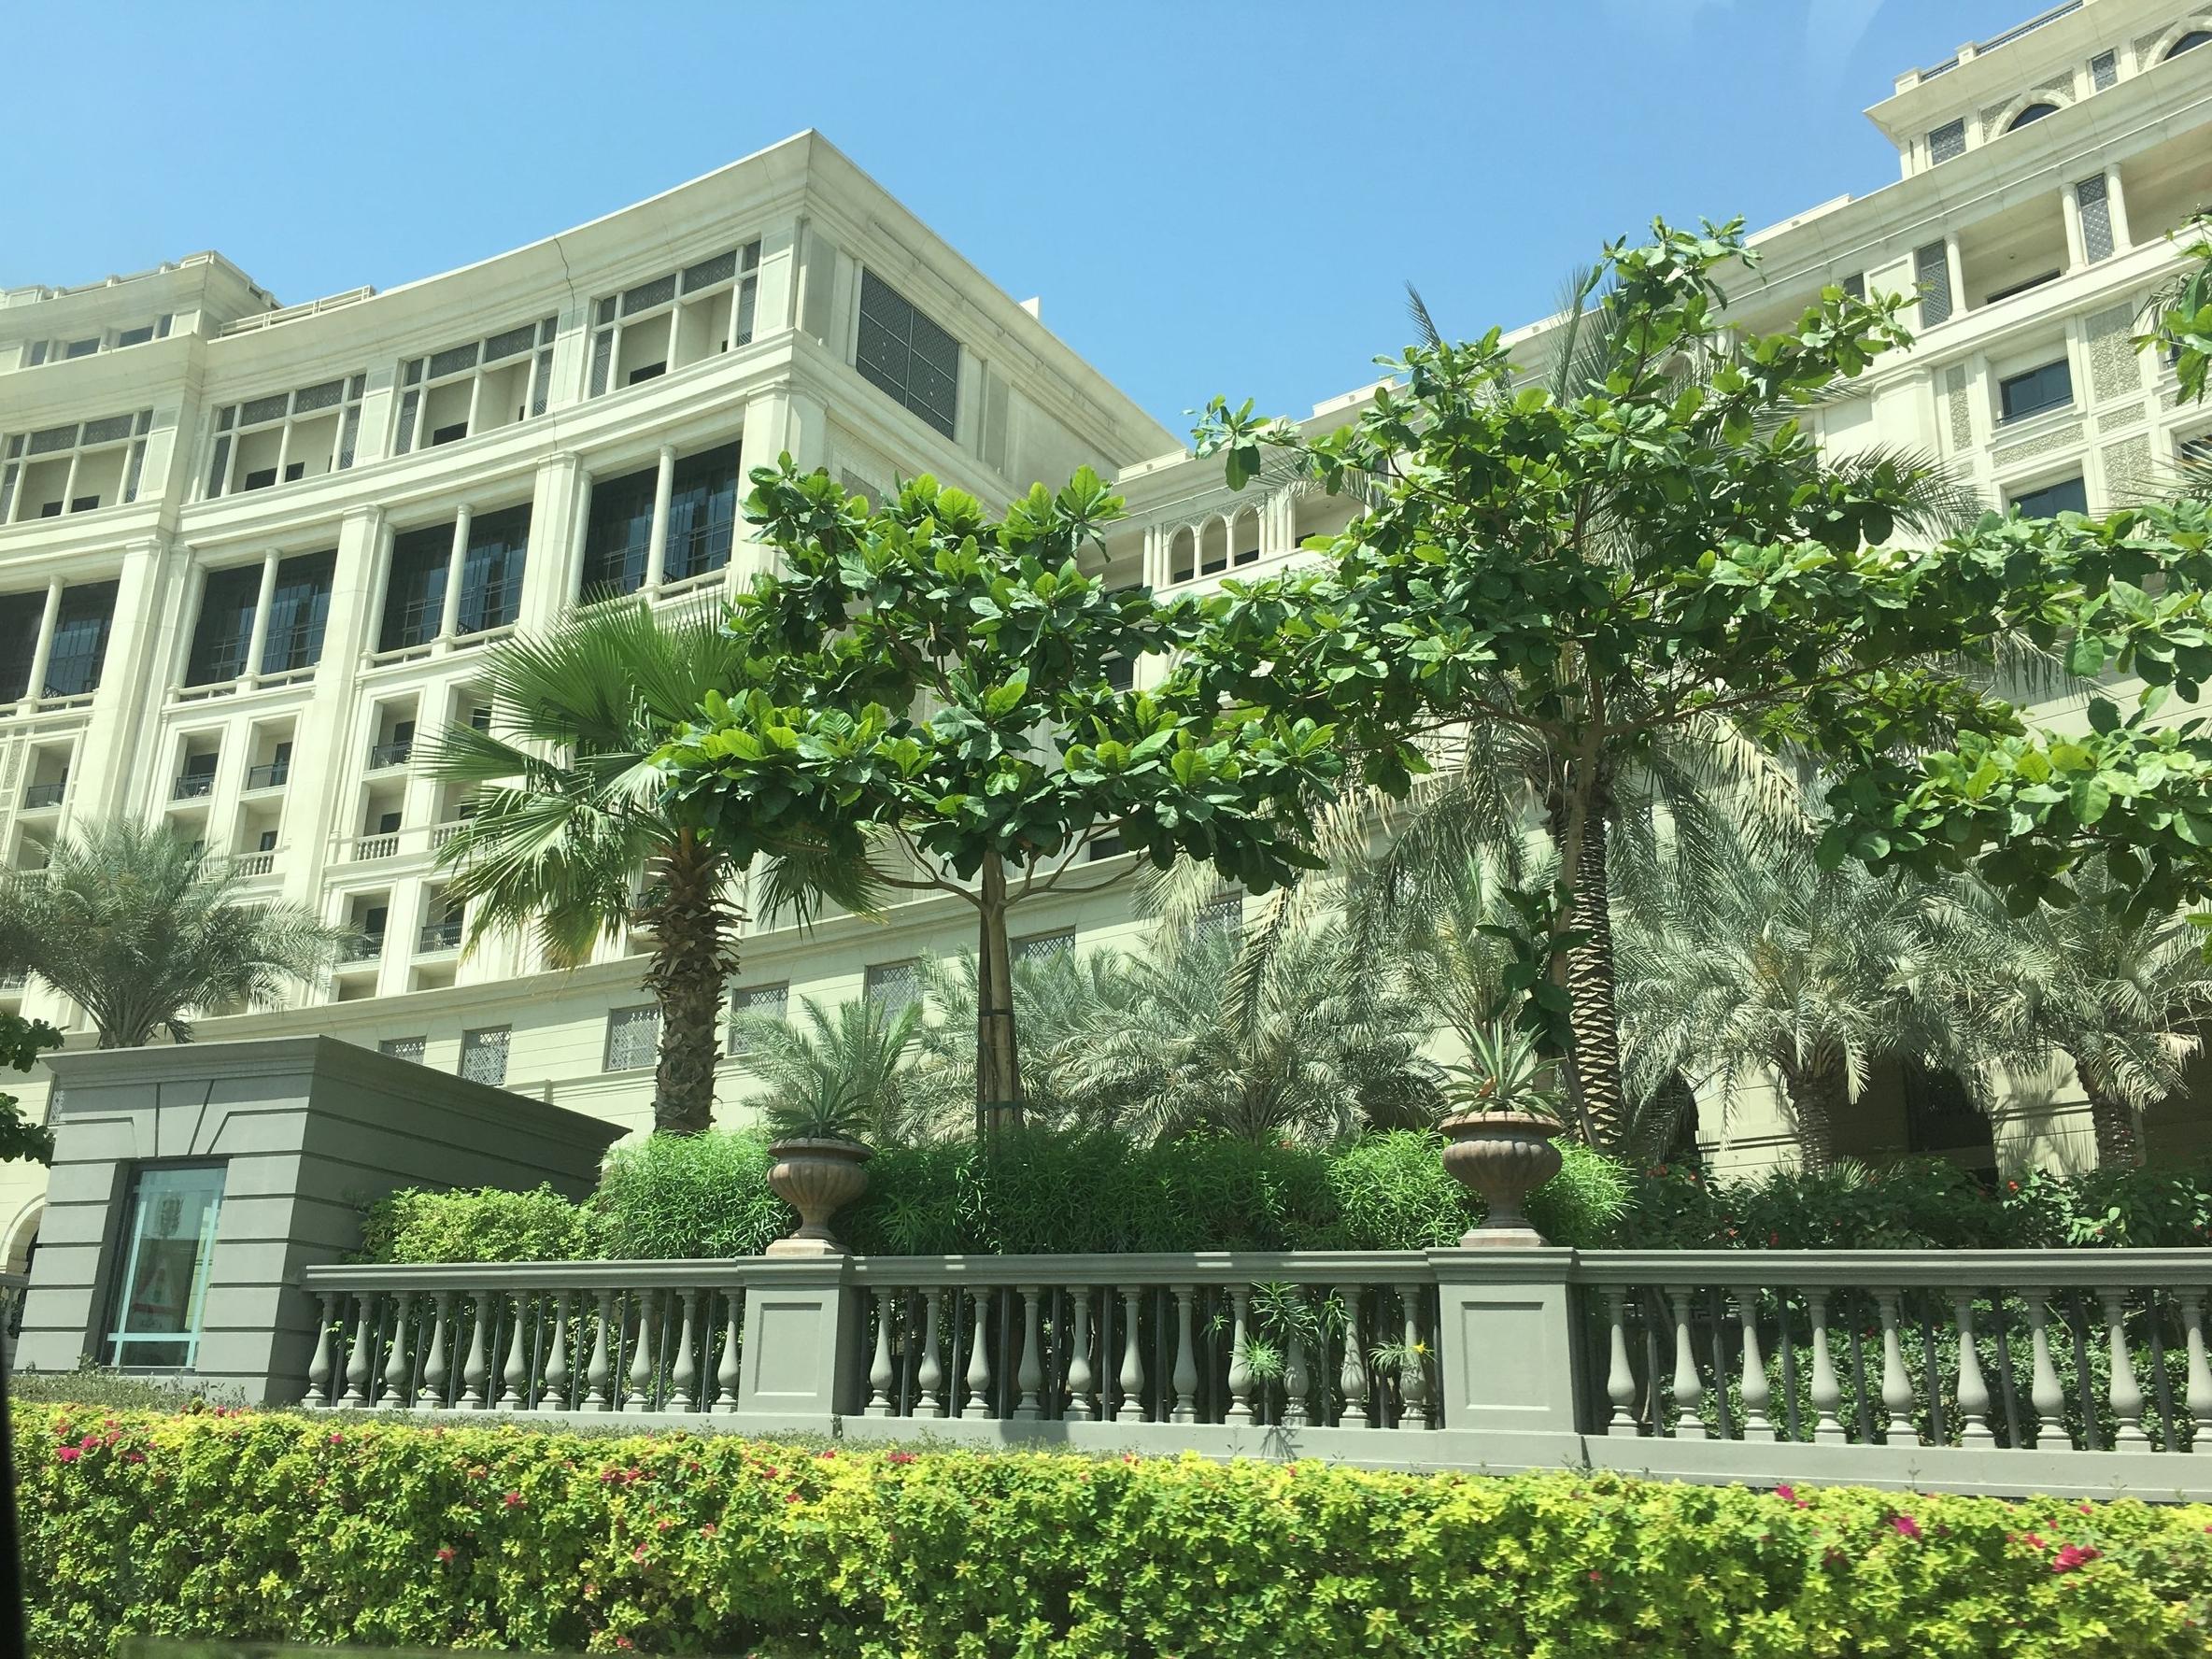 Arriving at the Palazzo Versace Dubai